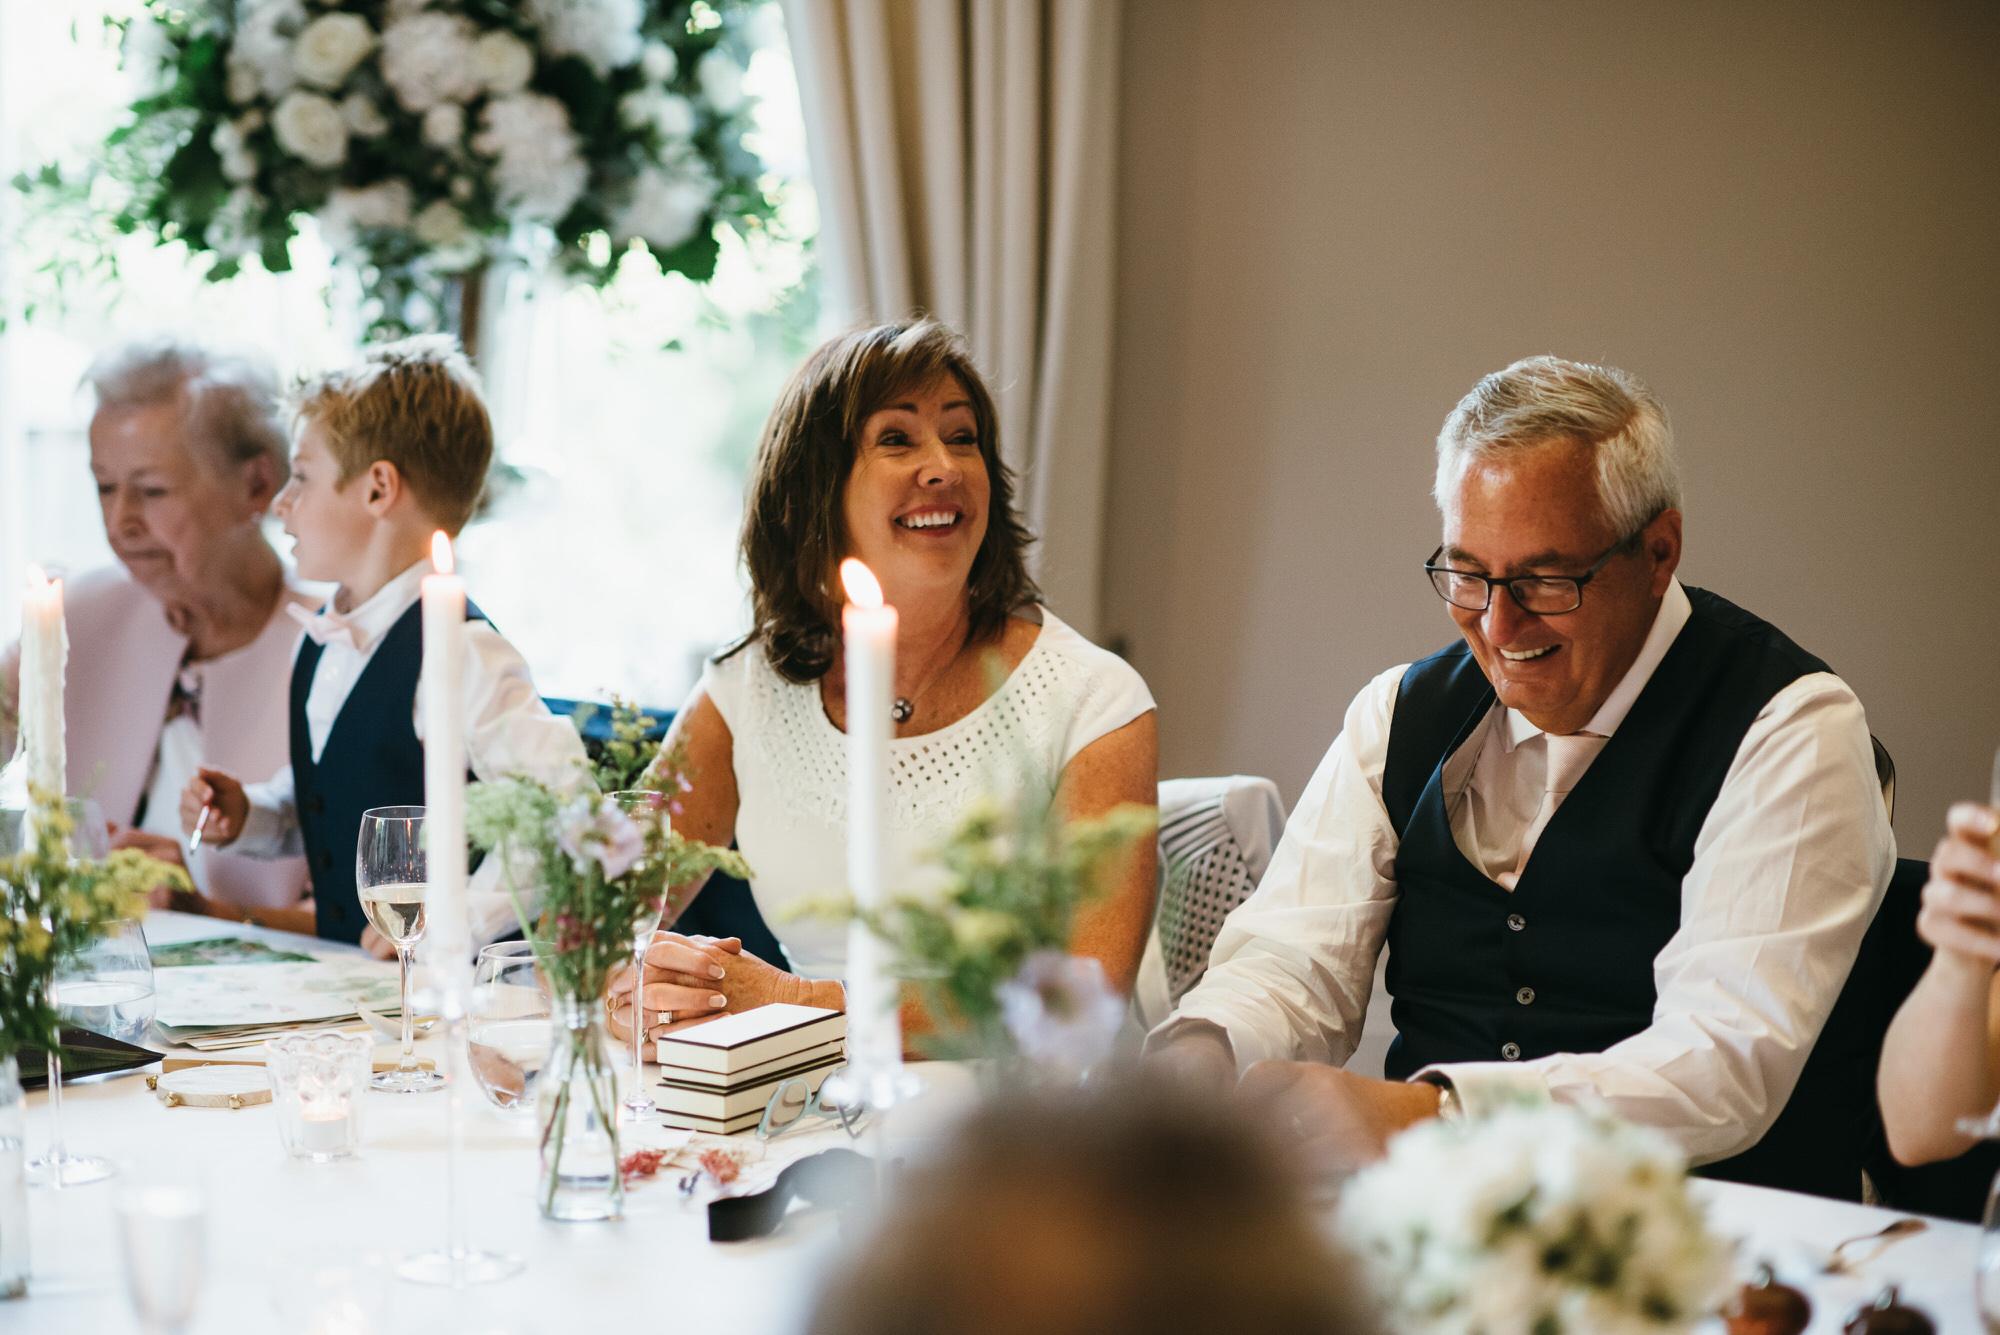 Coworth park speeches at wedding